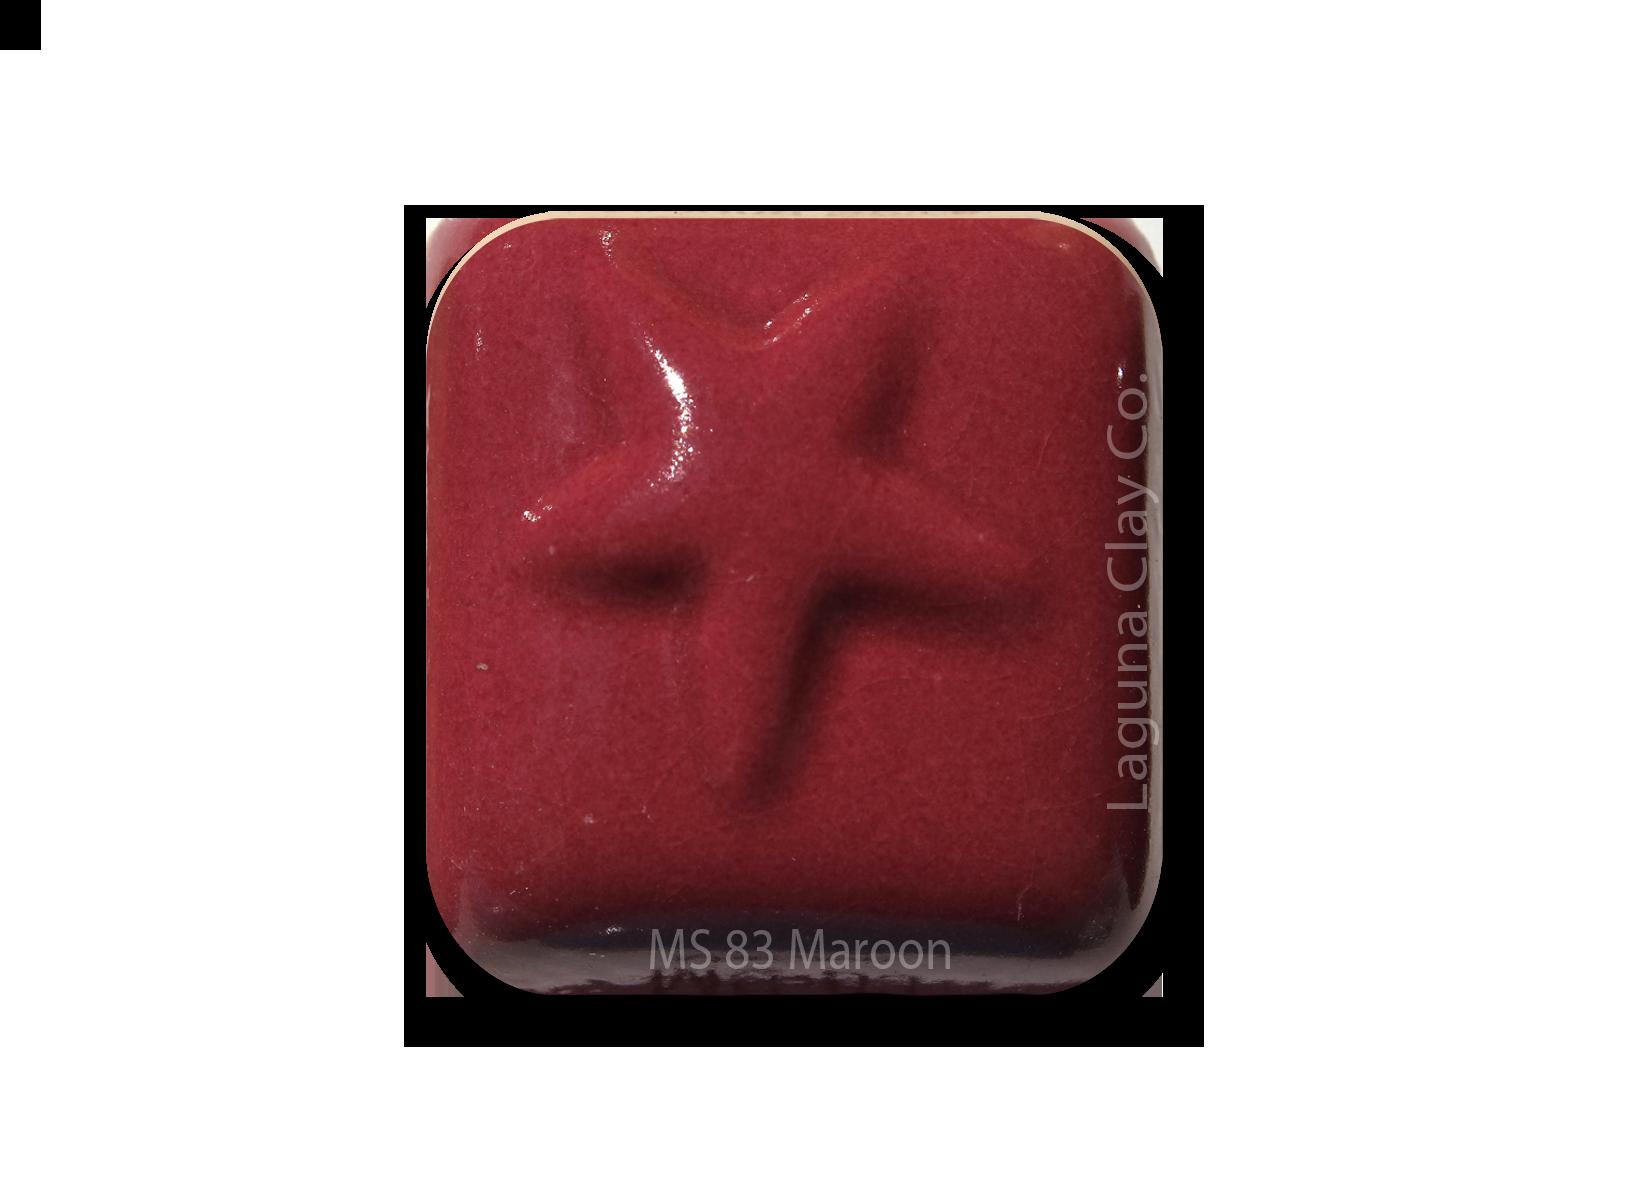 MS-83 Maroon